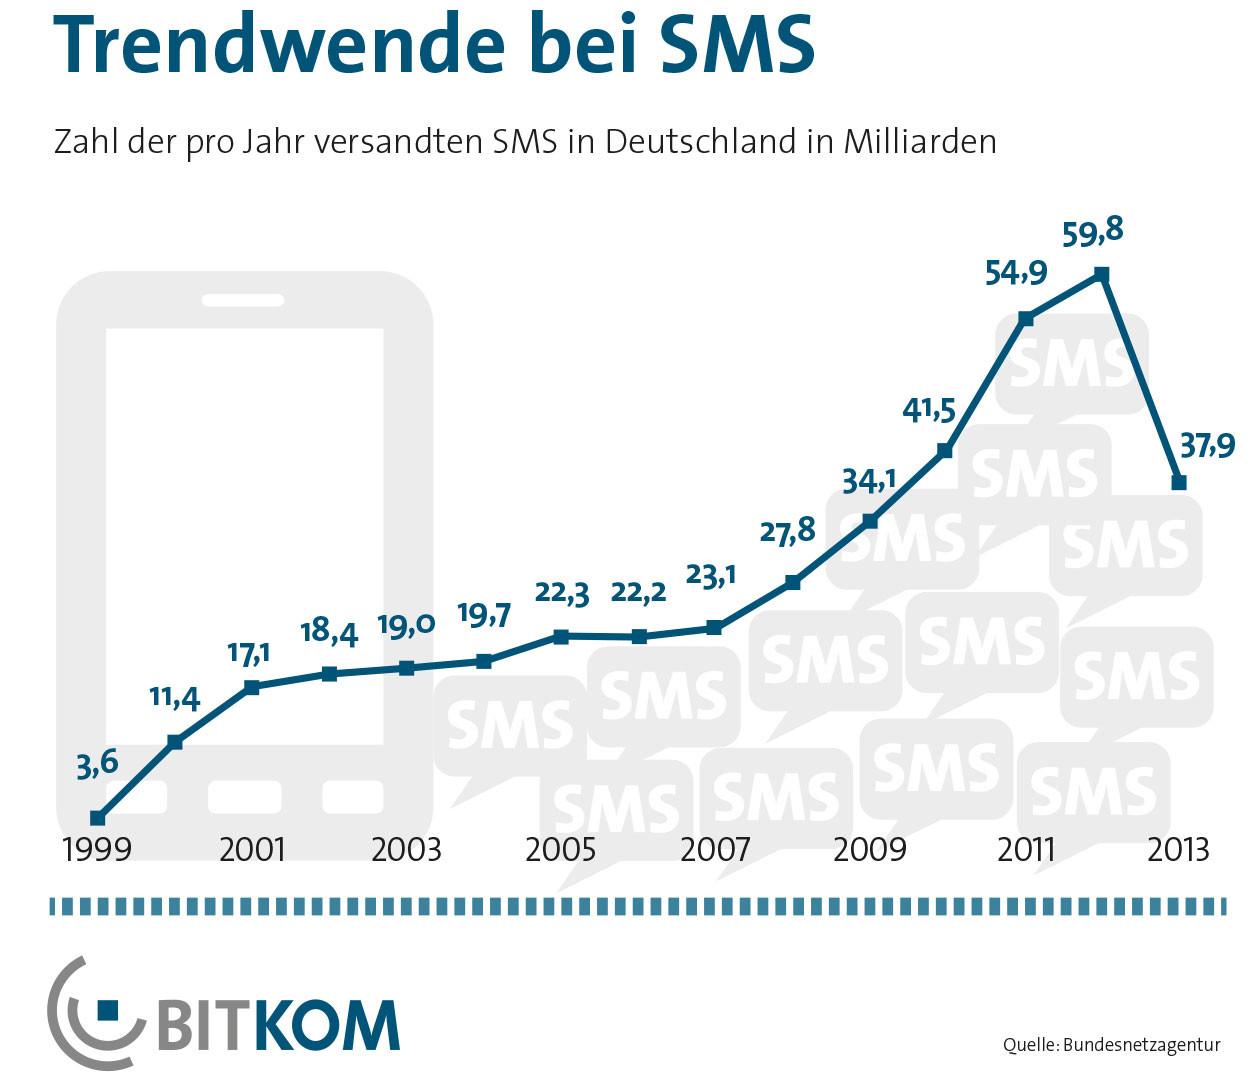 SMS Rückgang im Jahr 2013